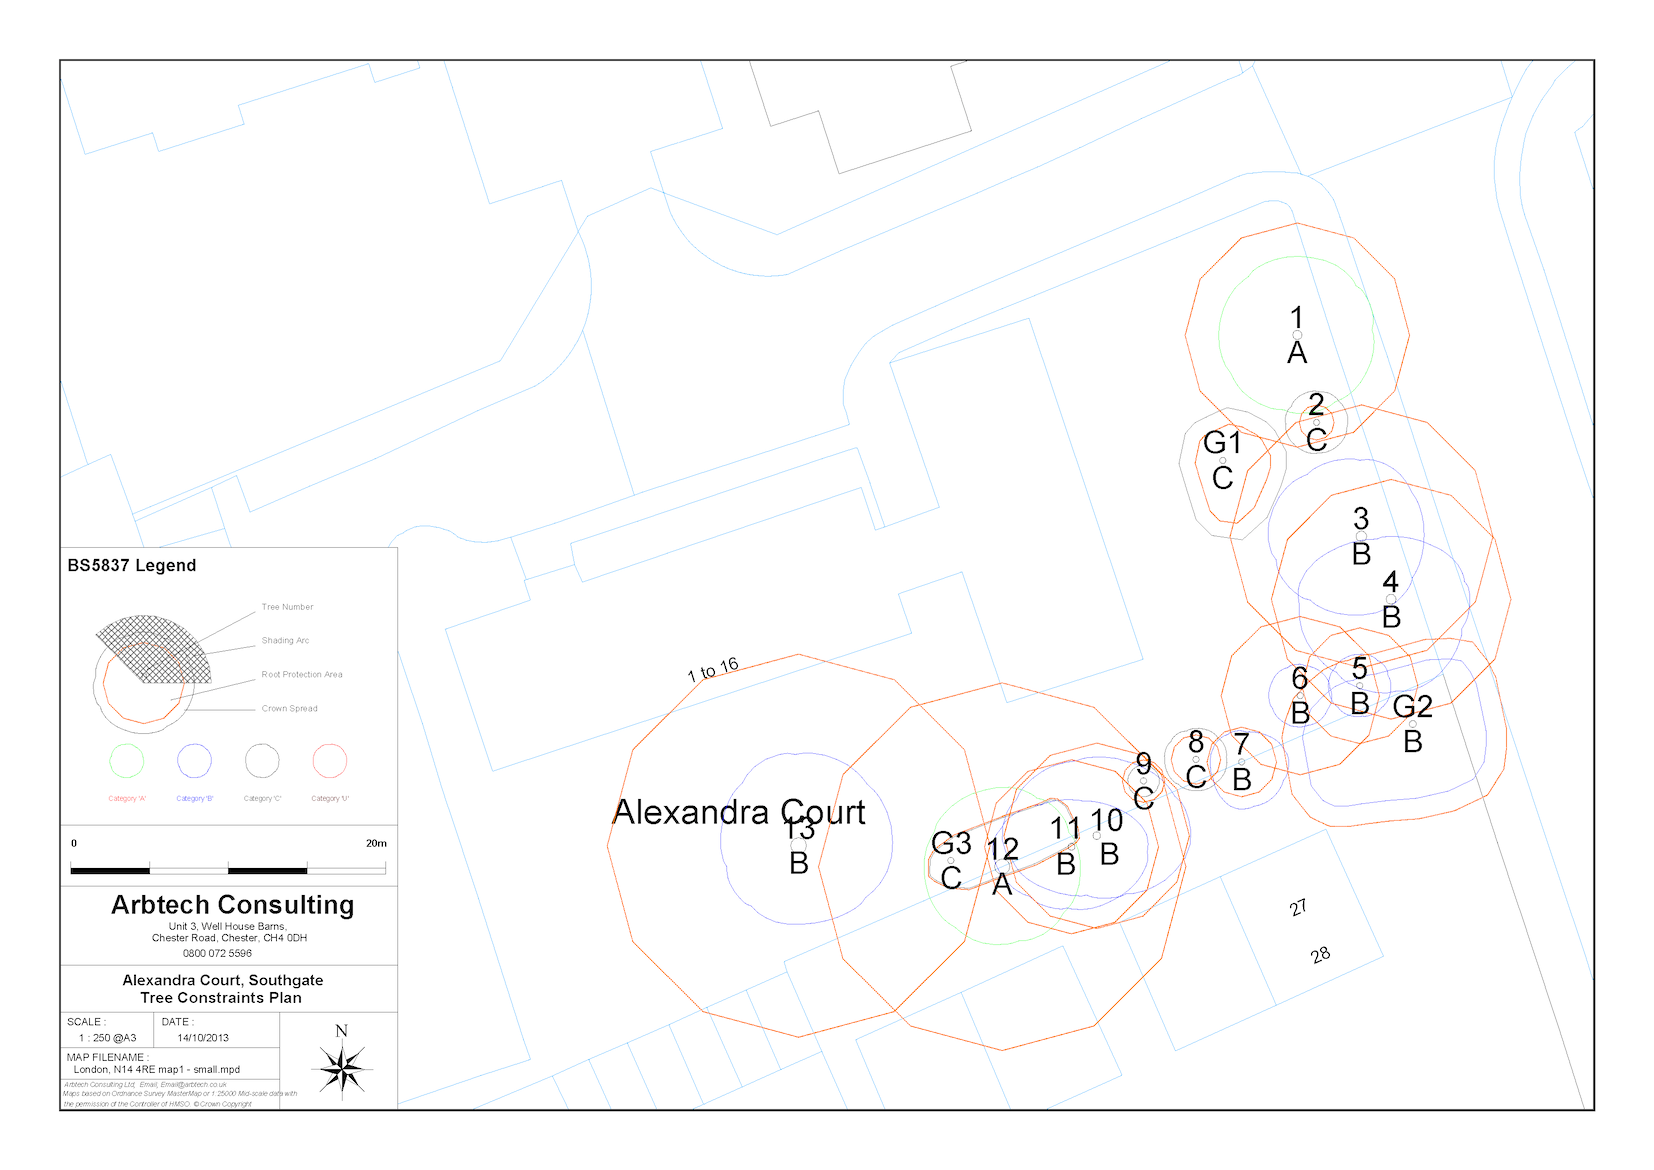 Tree Constraints Plan drawing